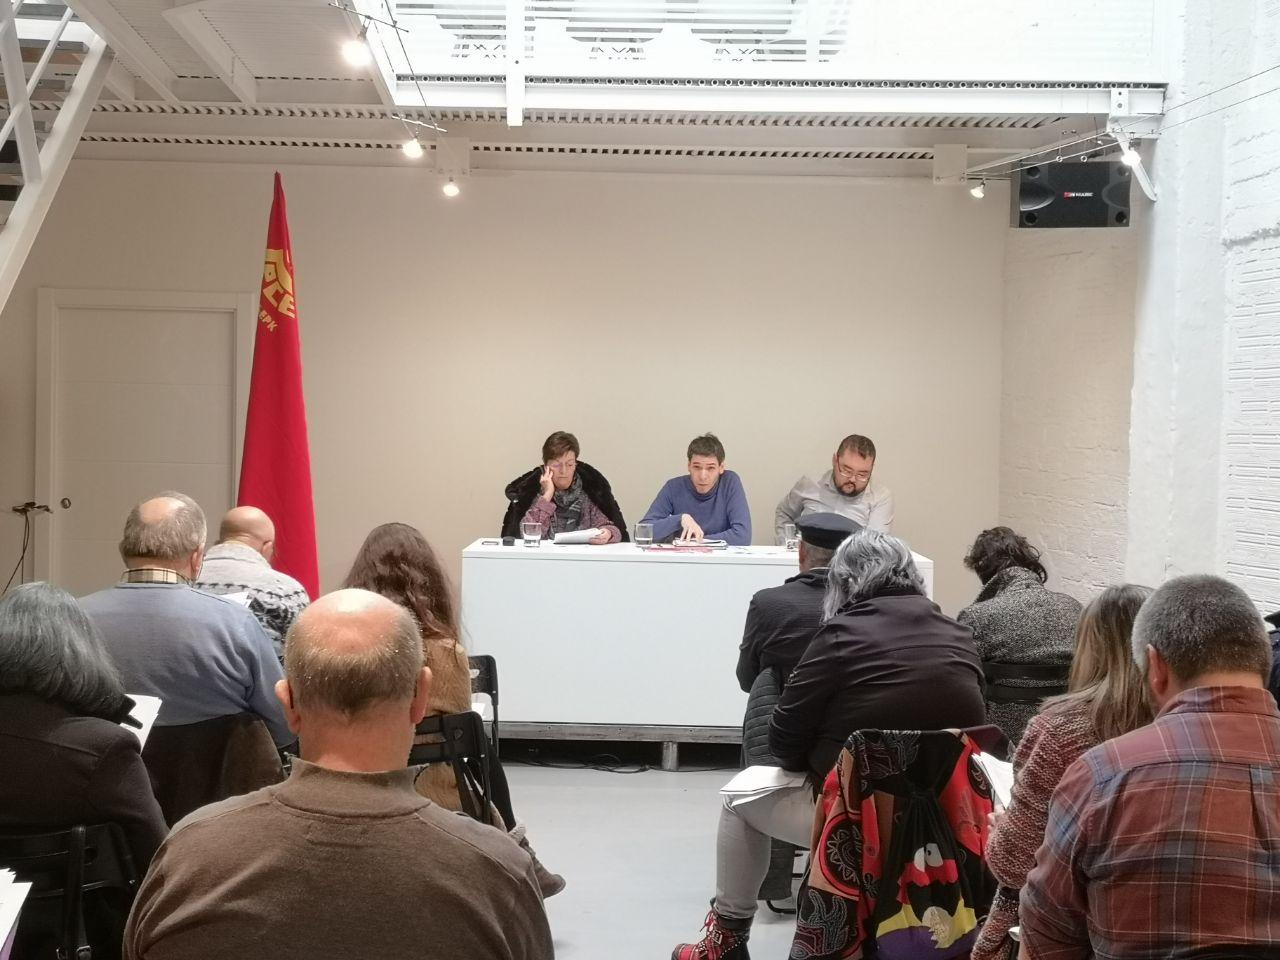 El Comité Nacional del Partido Comunista de Euskadi se reunió en Bilbao este fin de semana.